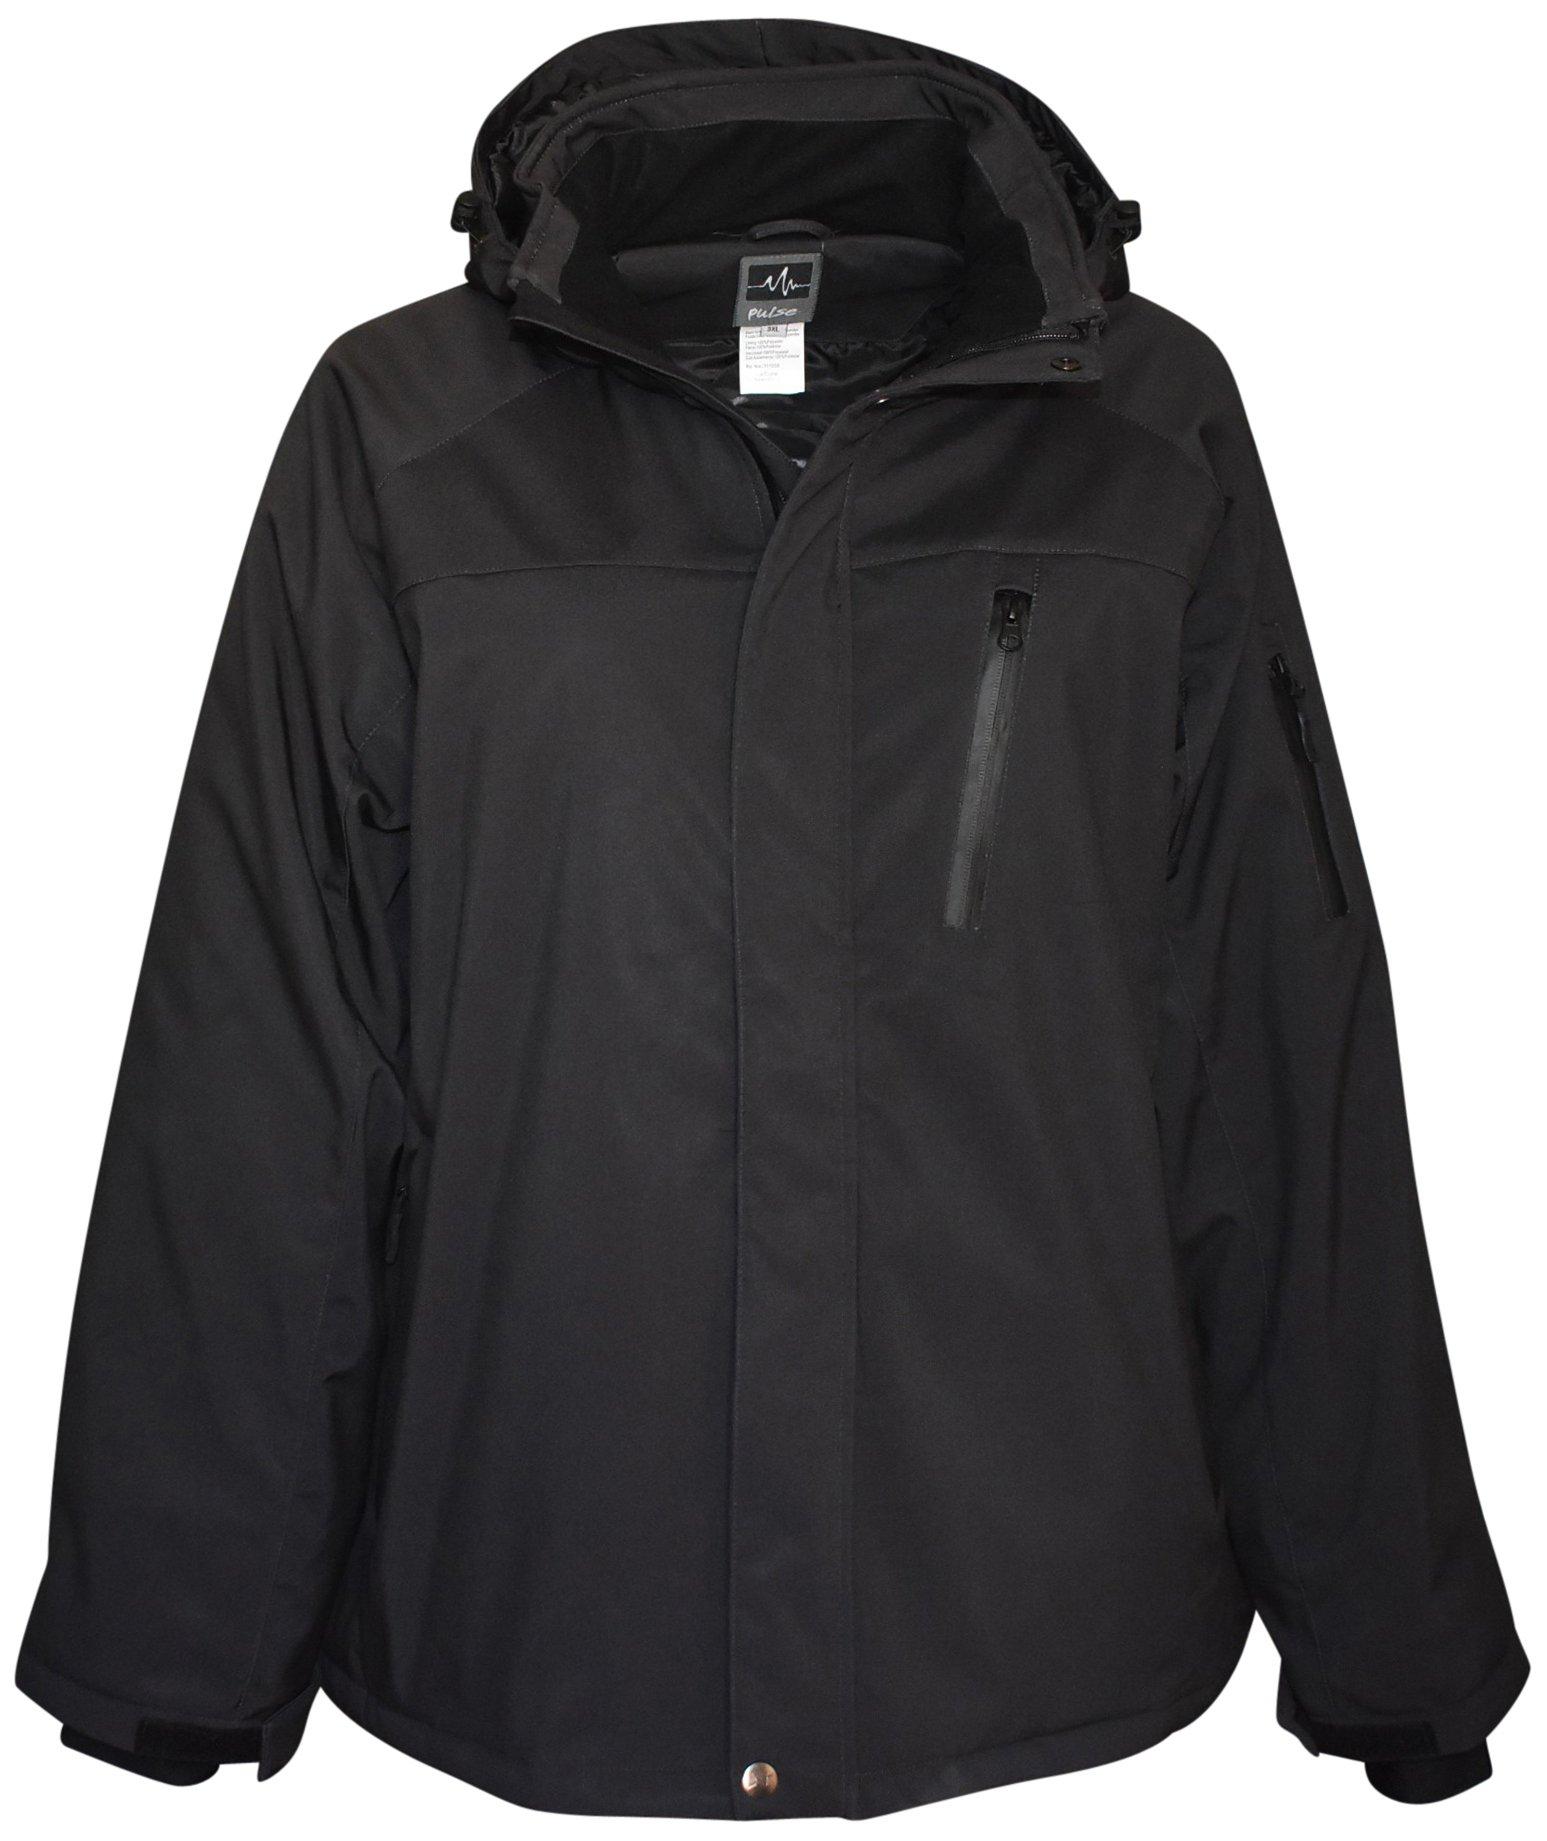 Pulse Mens Big Sizes Insulated Soft Shell Jacket (5XL, Onyx Black)